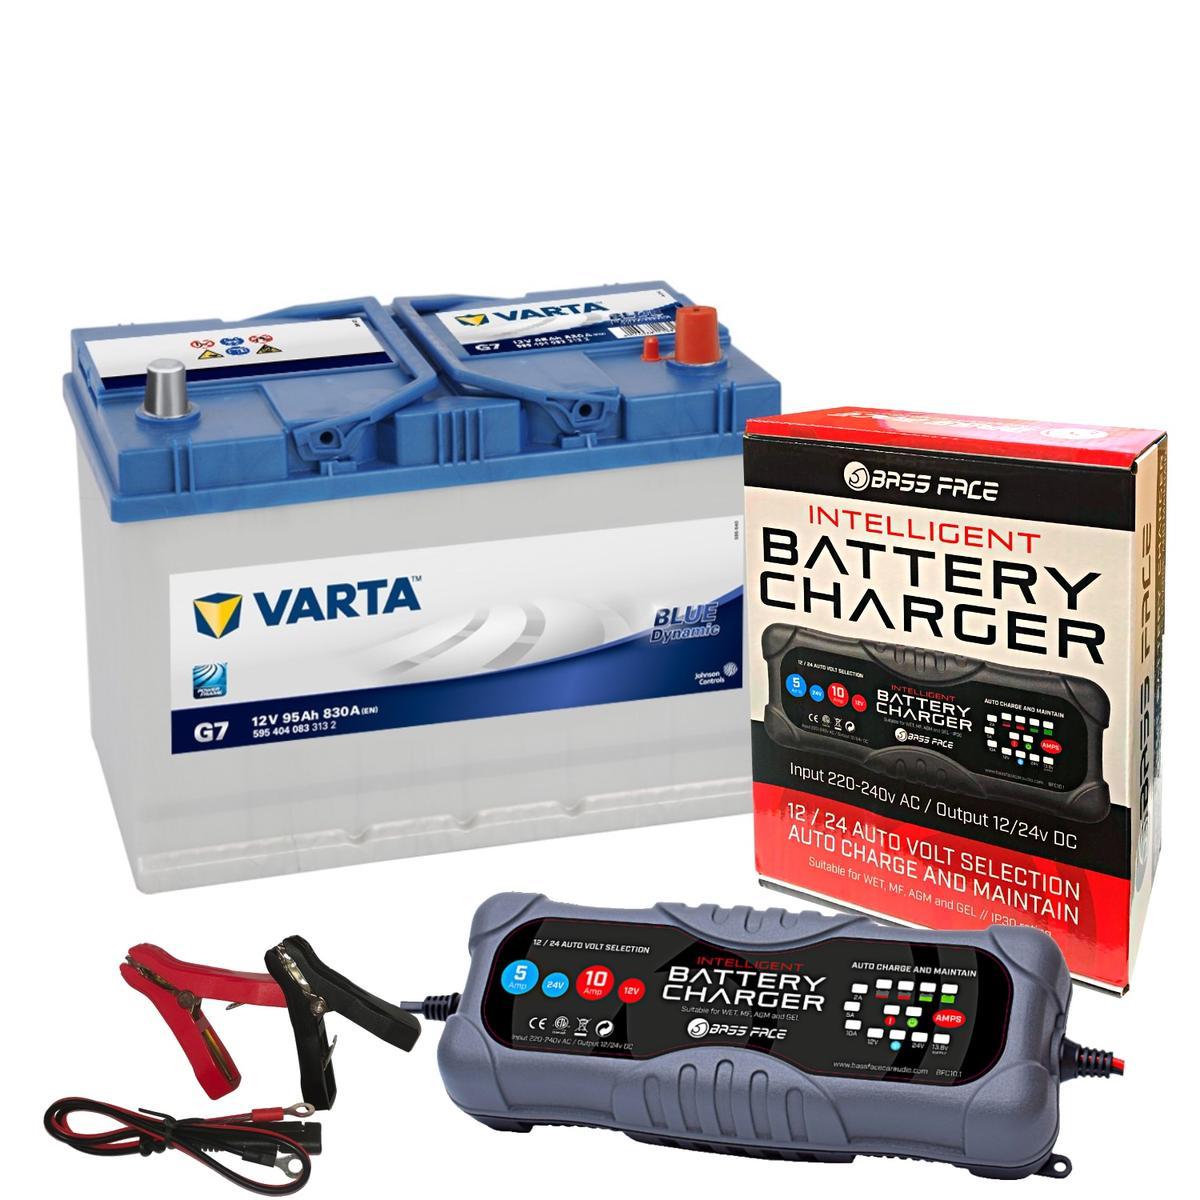 Varta G7 Nissan Car Battery 12v 4 Year 335 / 249H 95Ah 830CCA W/ 10 Amp Charger